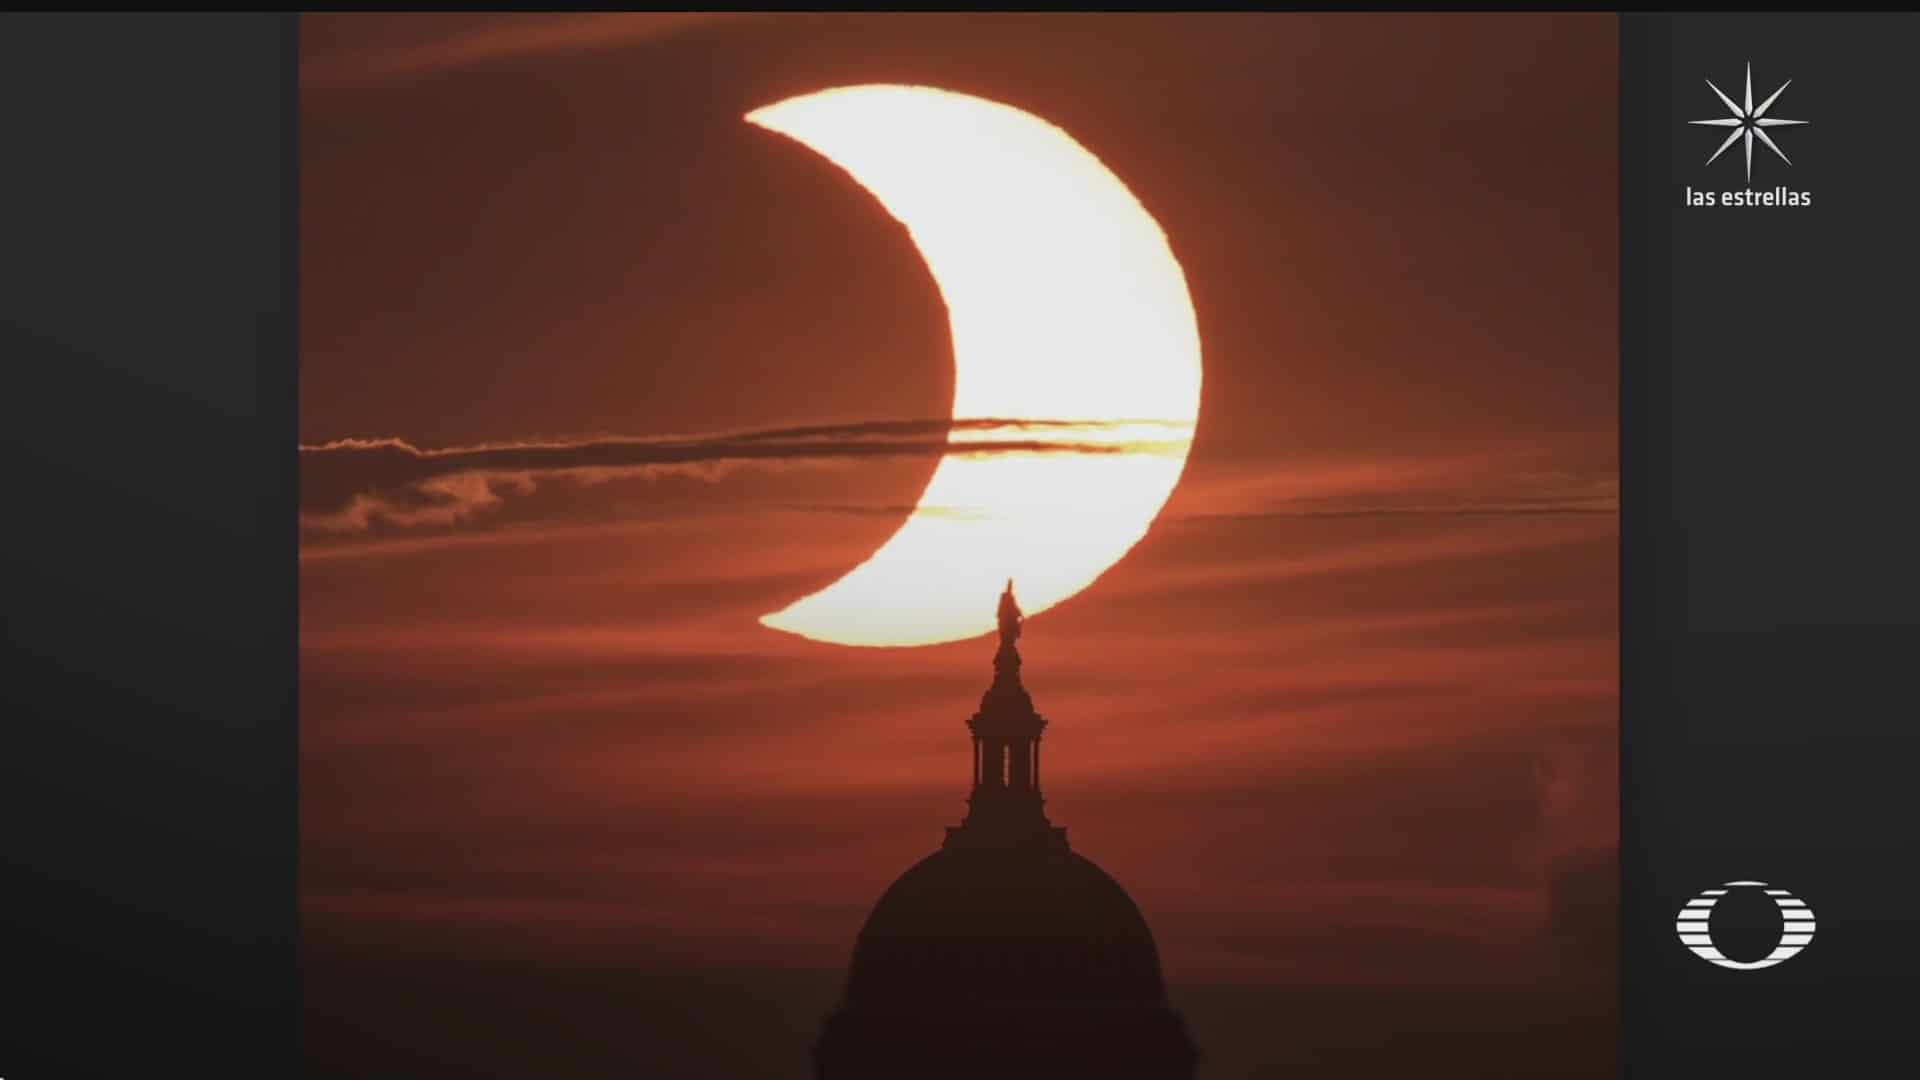 eclipse solar sorprende a paises del hemisferio norte